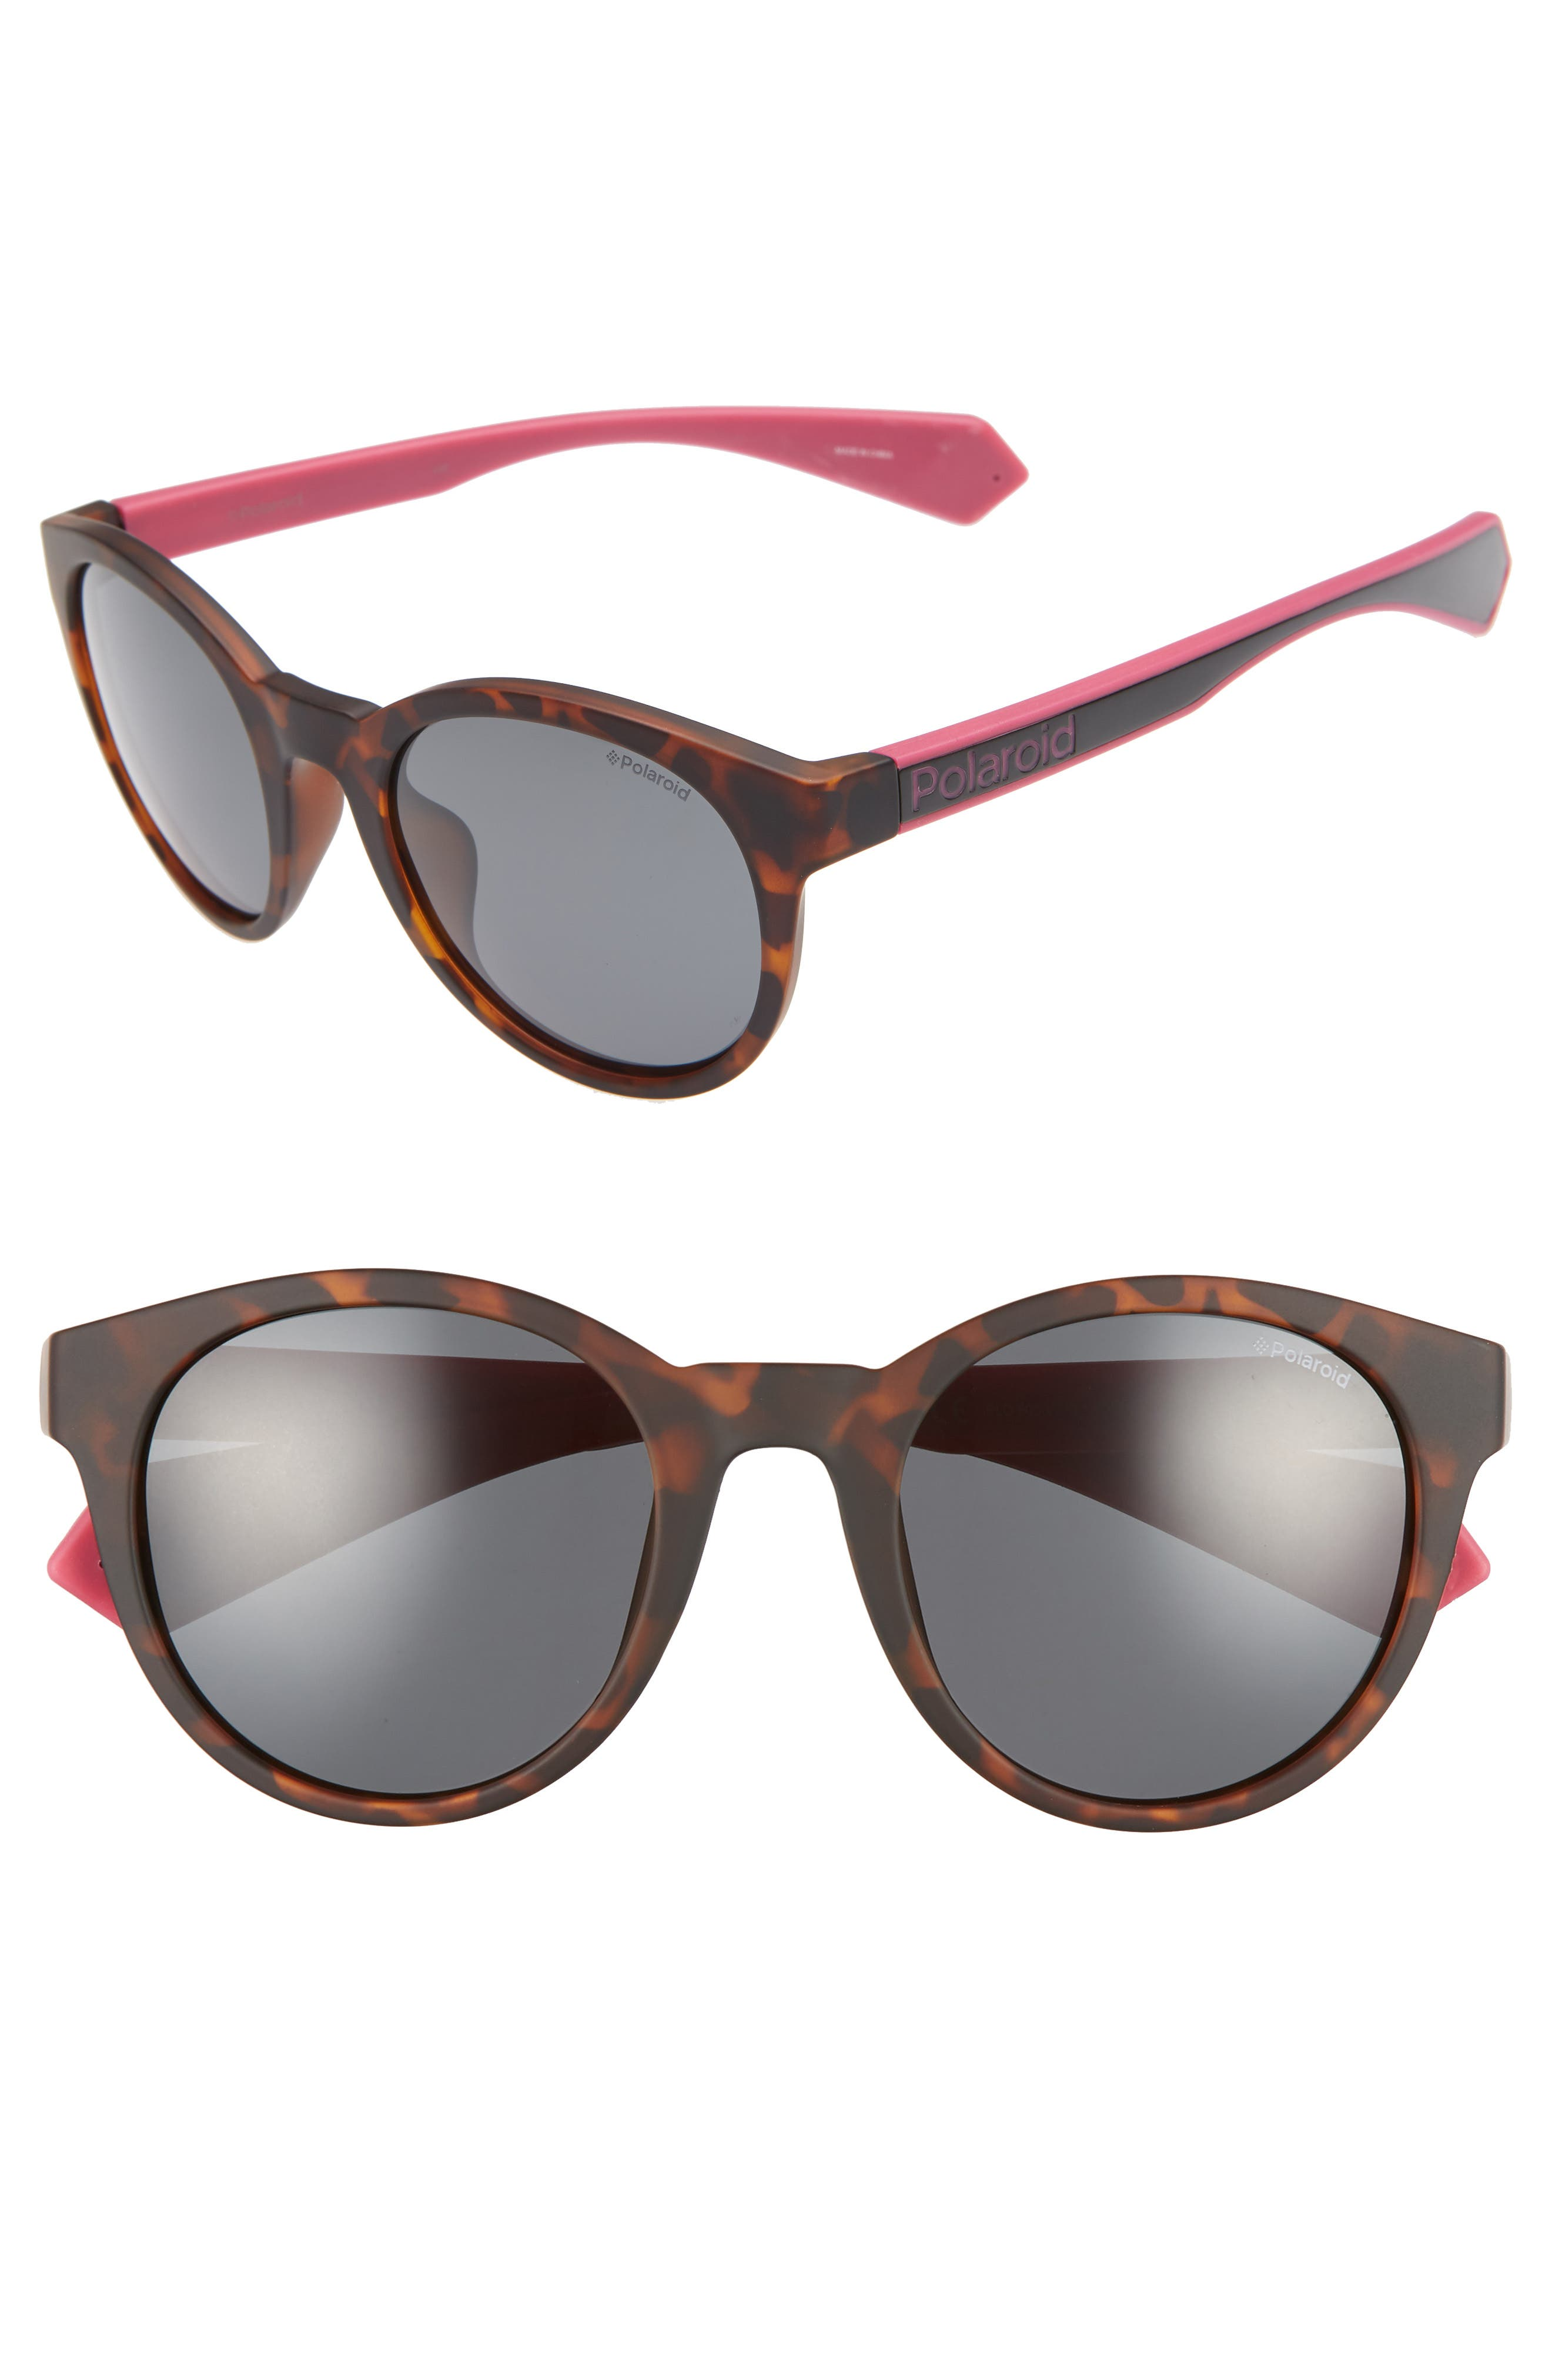 Polaroid 52Mm Polarized Round Sunglasses -